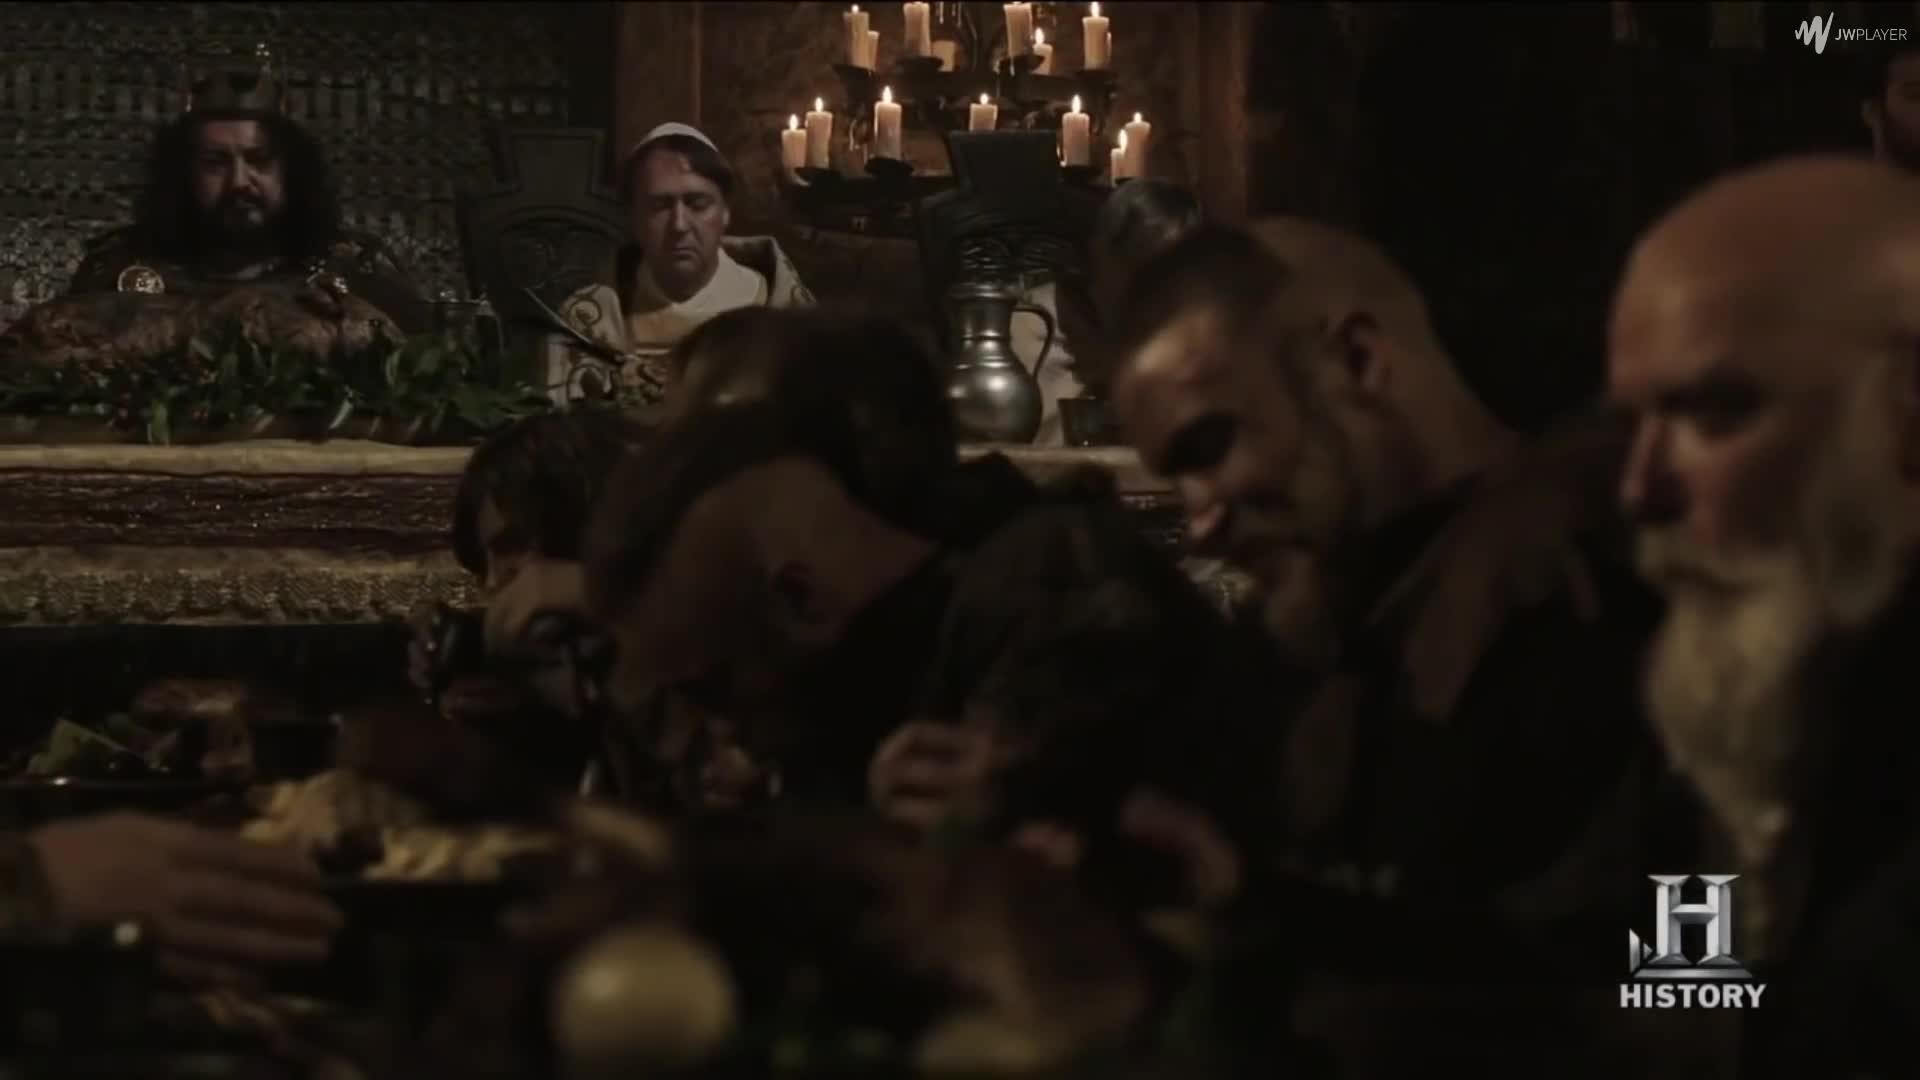 Aethelwulf, Arne, Dinner, Erik, Feast, Floki, King Aella, Leif, Ragnar Lodbrok, Torstein, Dinner At King Aella's Villa GIFs